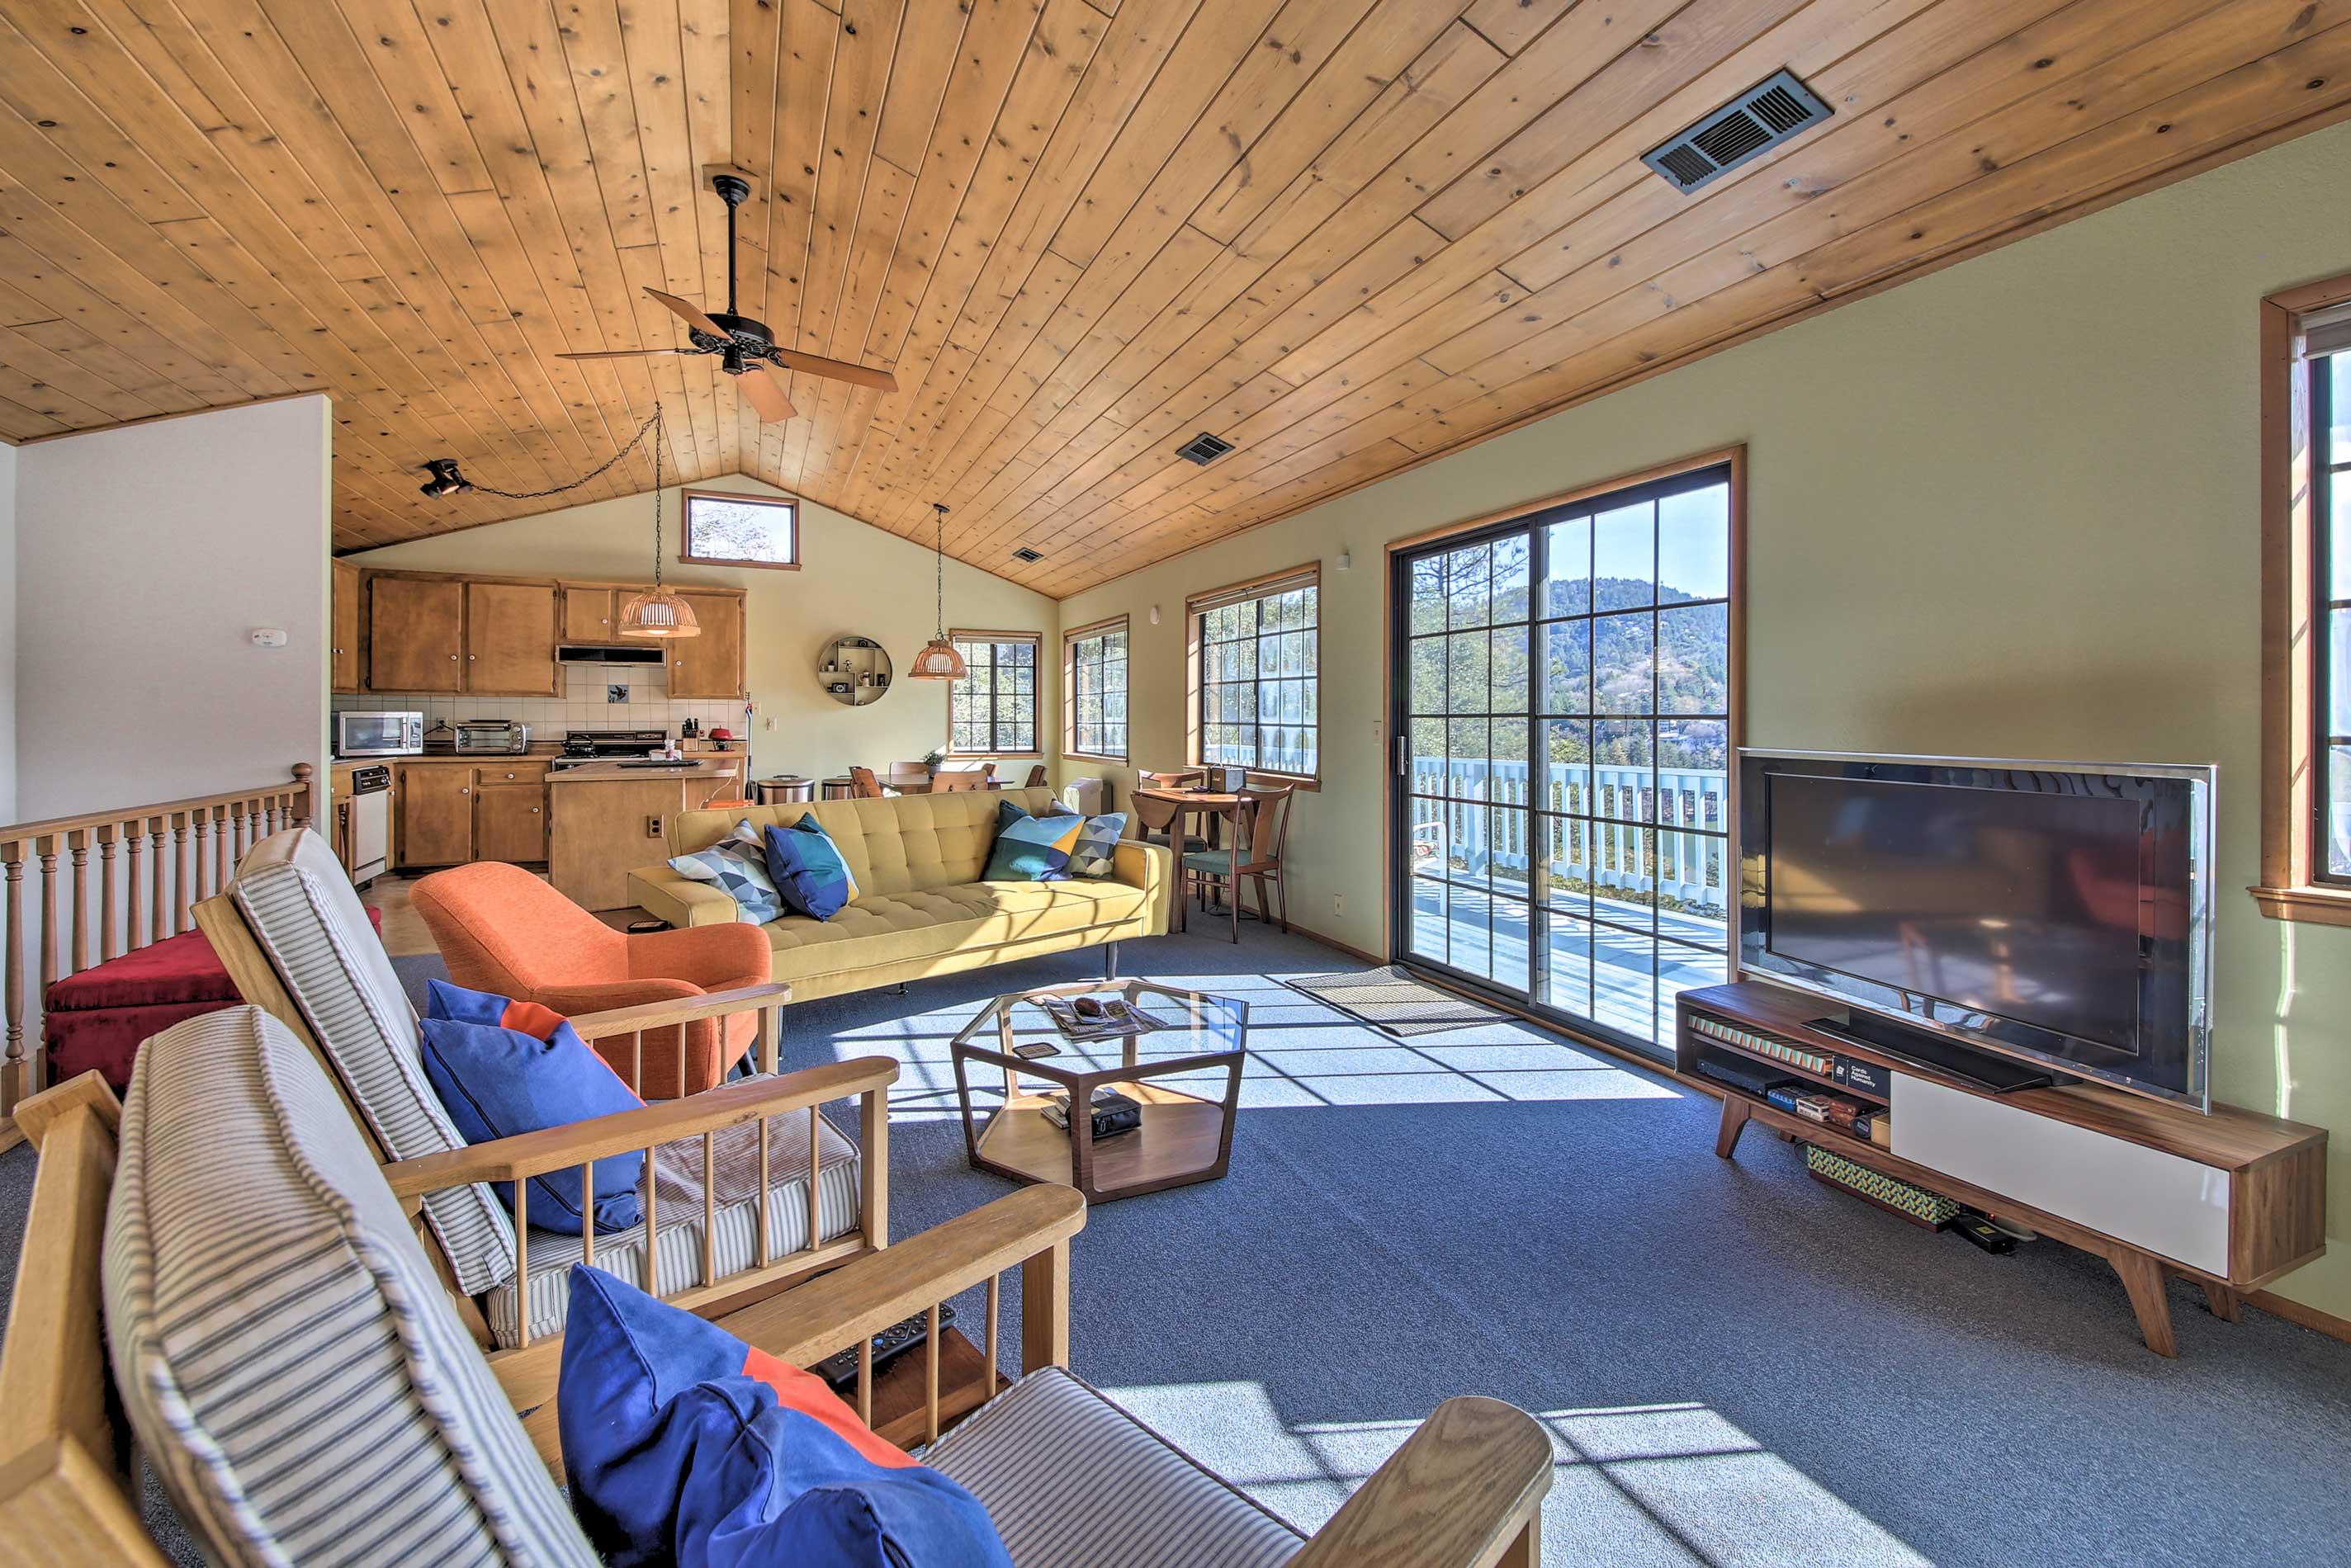 Make yourself comfortable in the open floor plan.